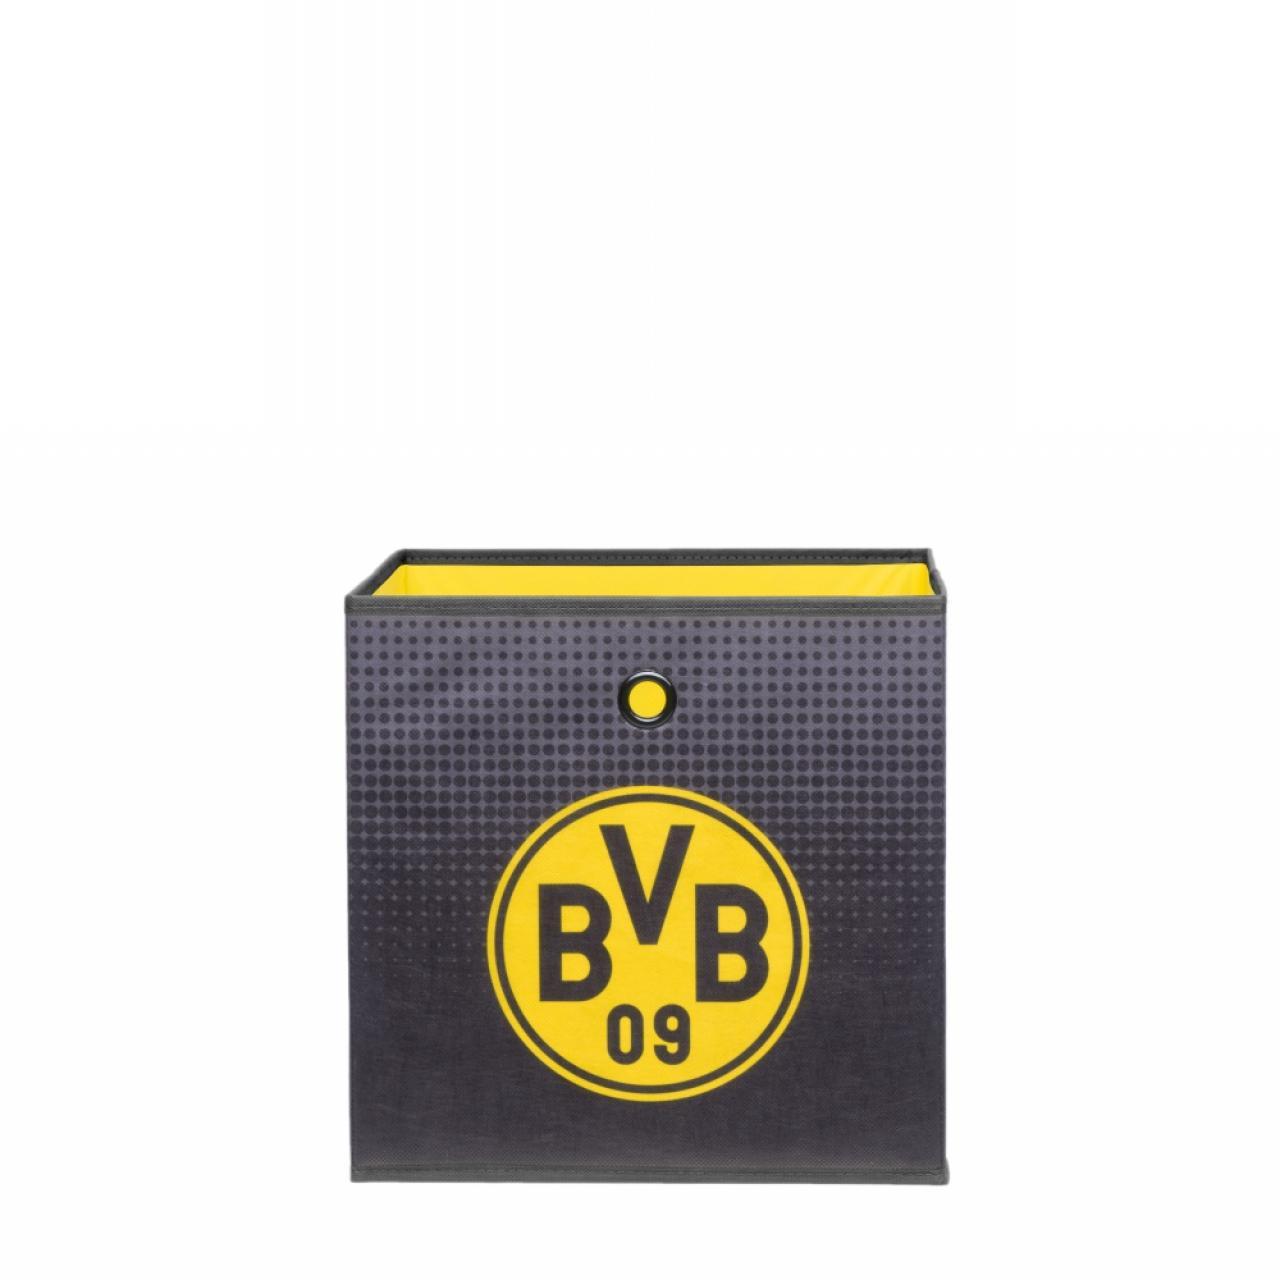 Faltbox mit Emblem Borussia Dortmund